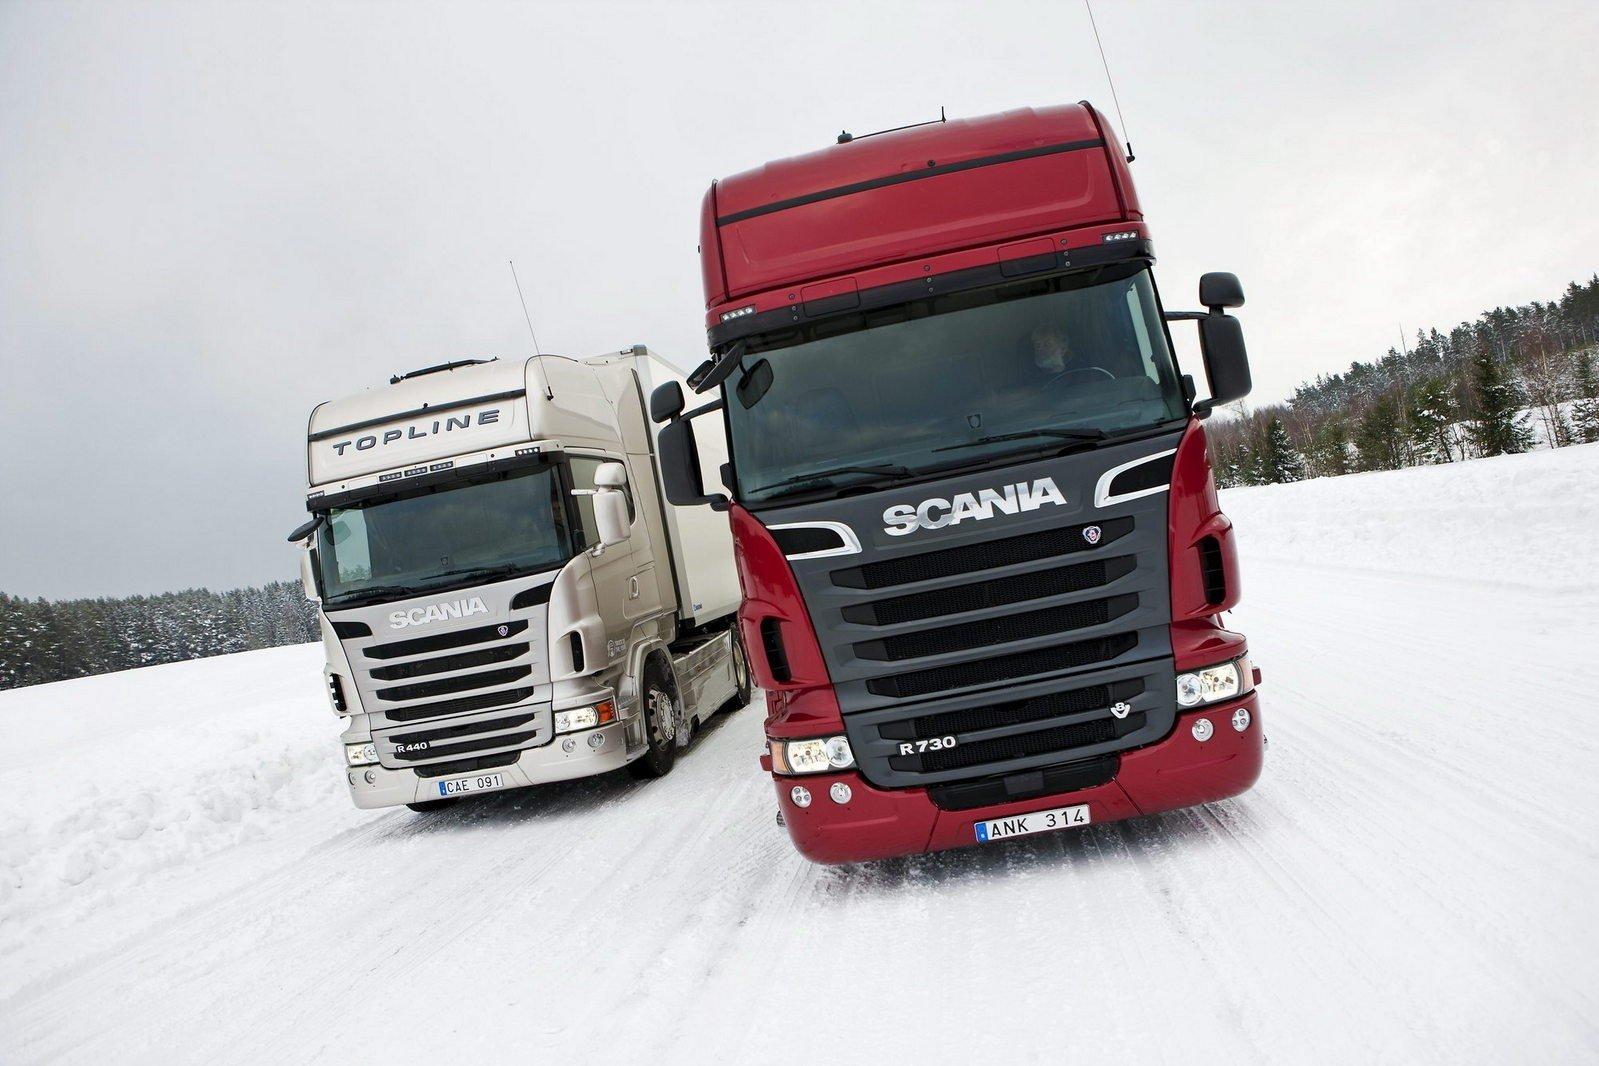 Wallpaper 1599x1066 Px Scania Truck 1599x1066 Wallbase